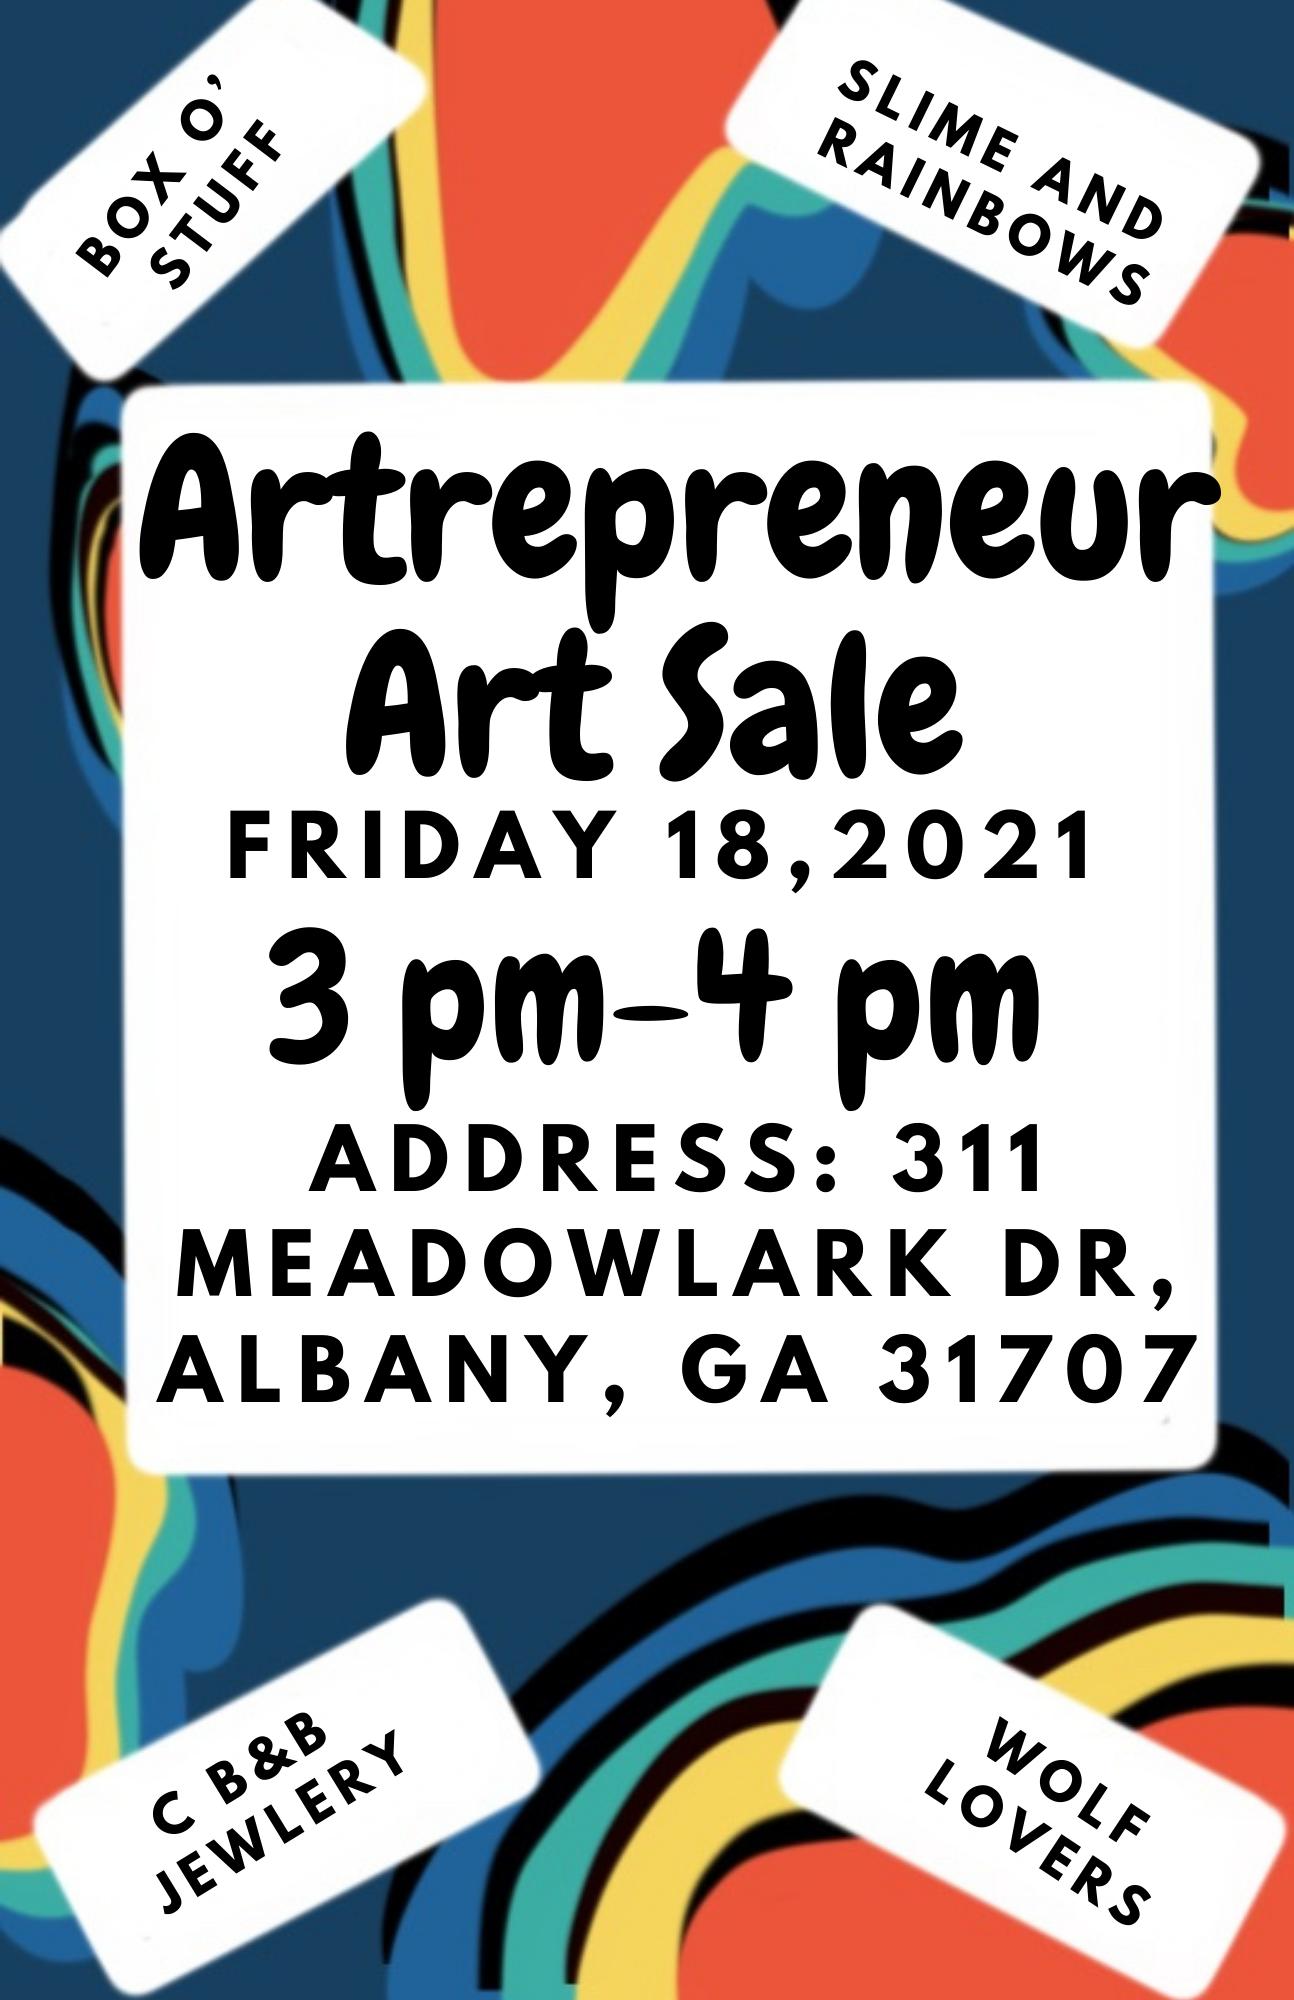 Artrepreneur Art Sale